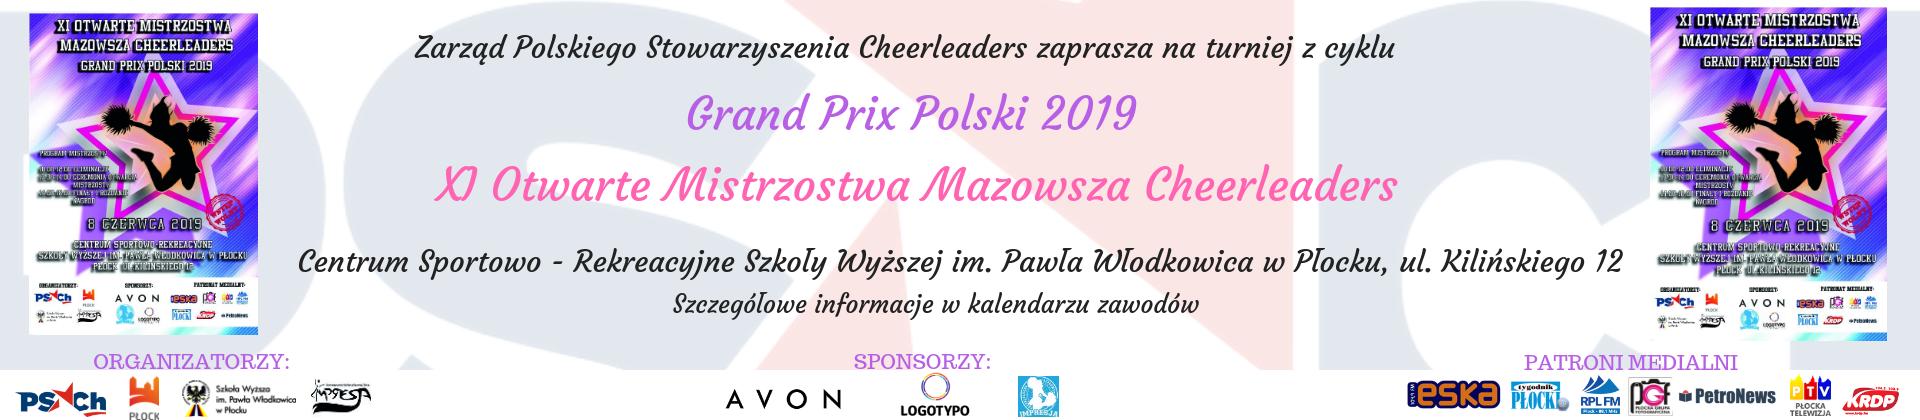 Grand Prix Polski Cheerleaders 2018 (1)